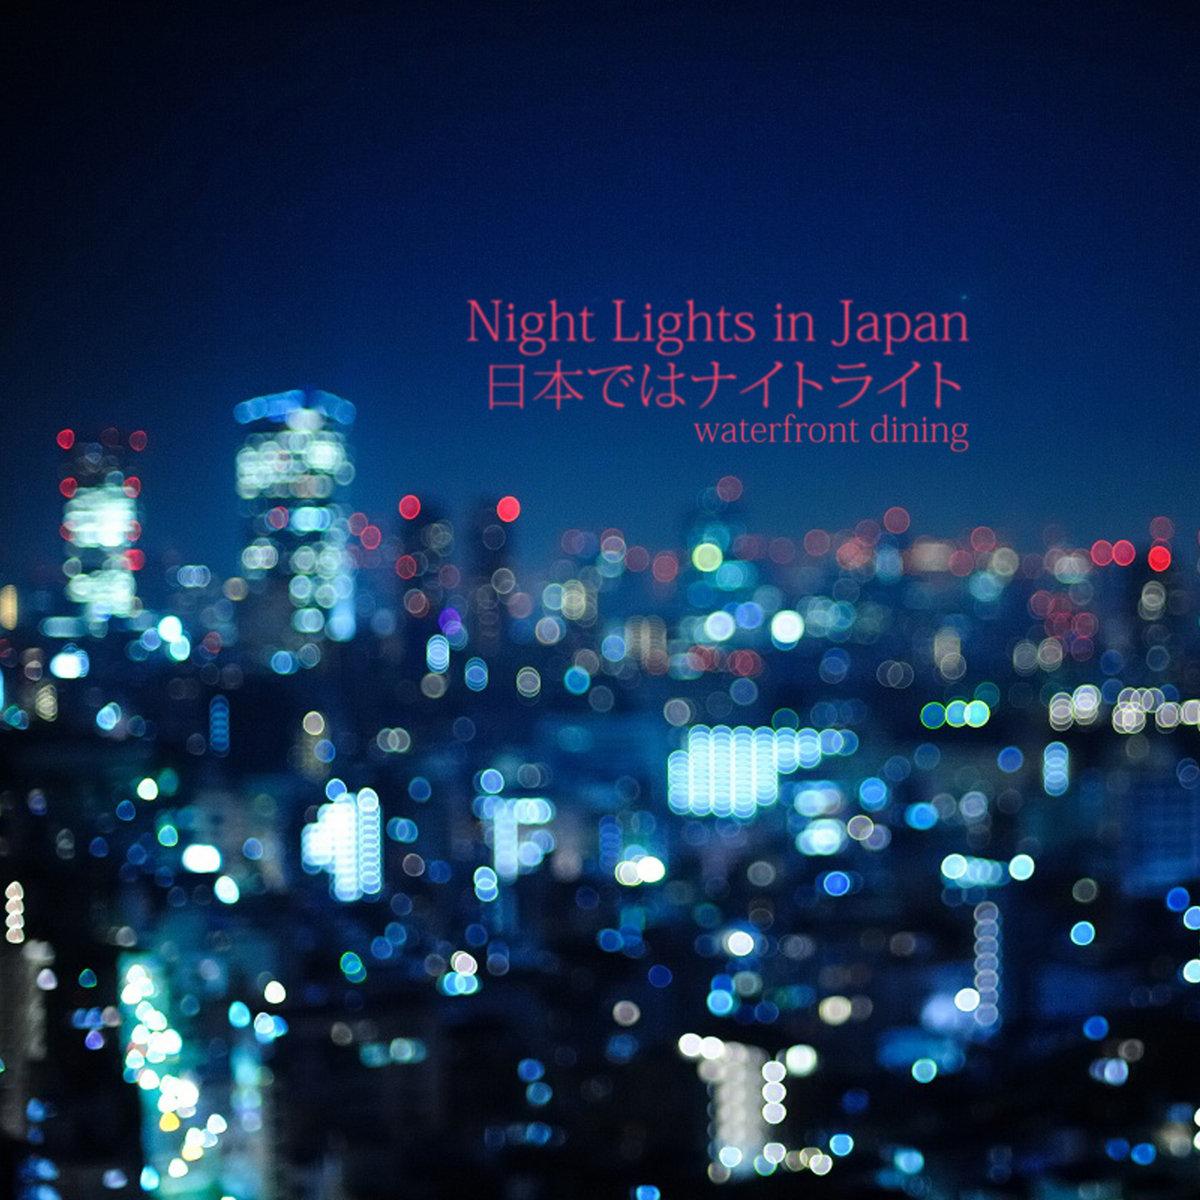 Night Lights In Japan 日本ではナイトライト Waterfront Dining